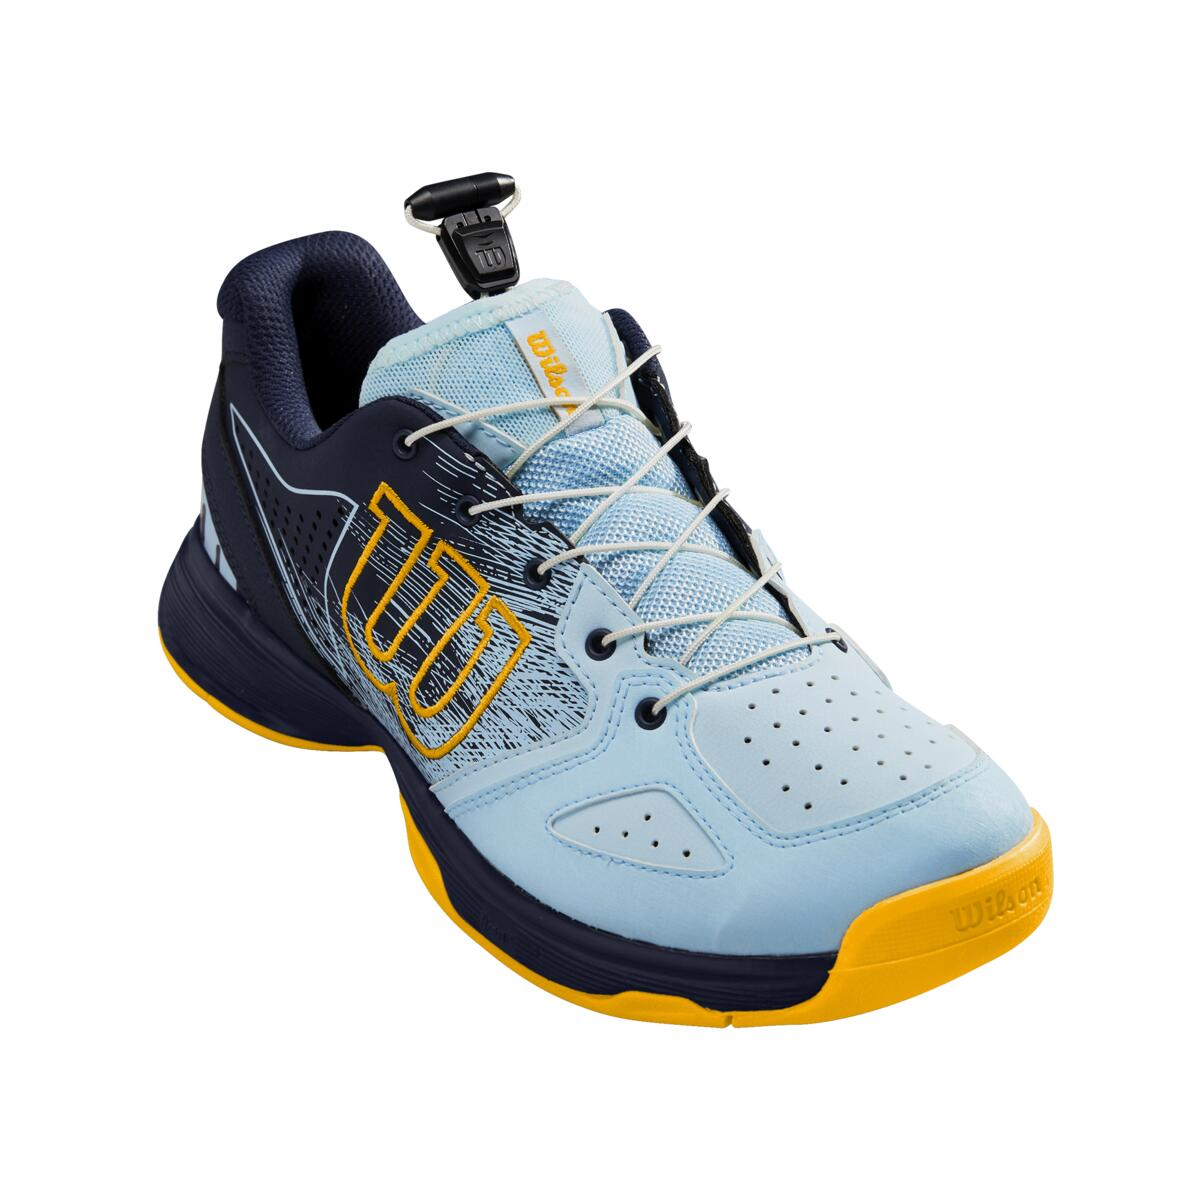 Dětská tenisová obuv Wilson Kaos Junior QL Omphalodes/Peacoat/Gold Velikost: UK 2